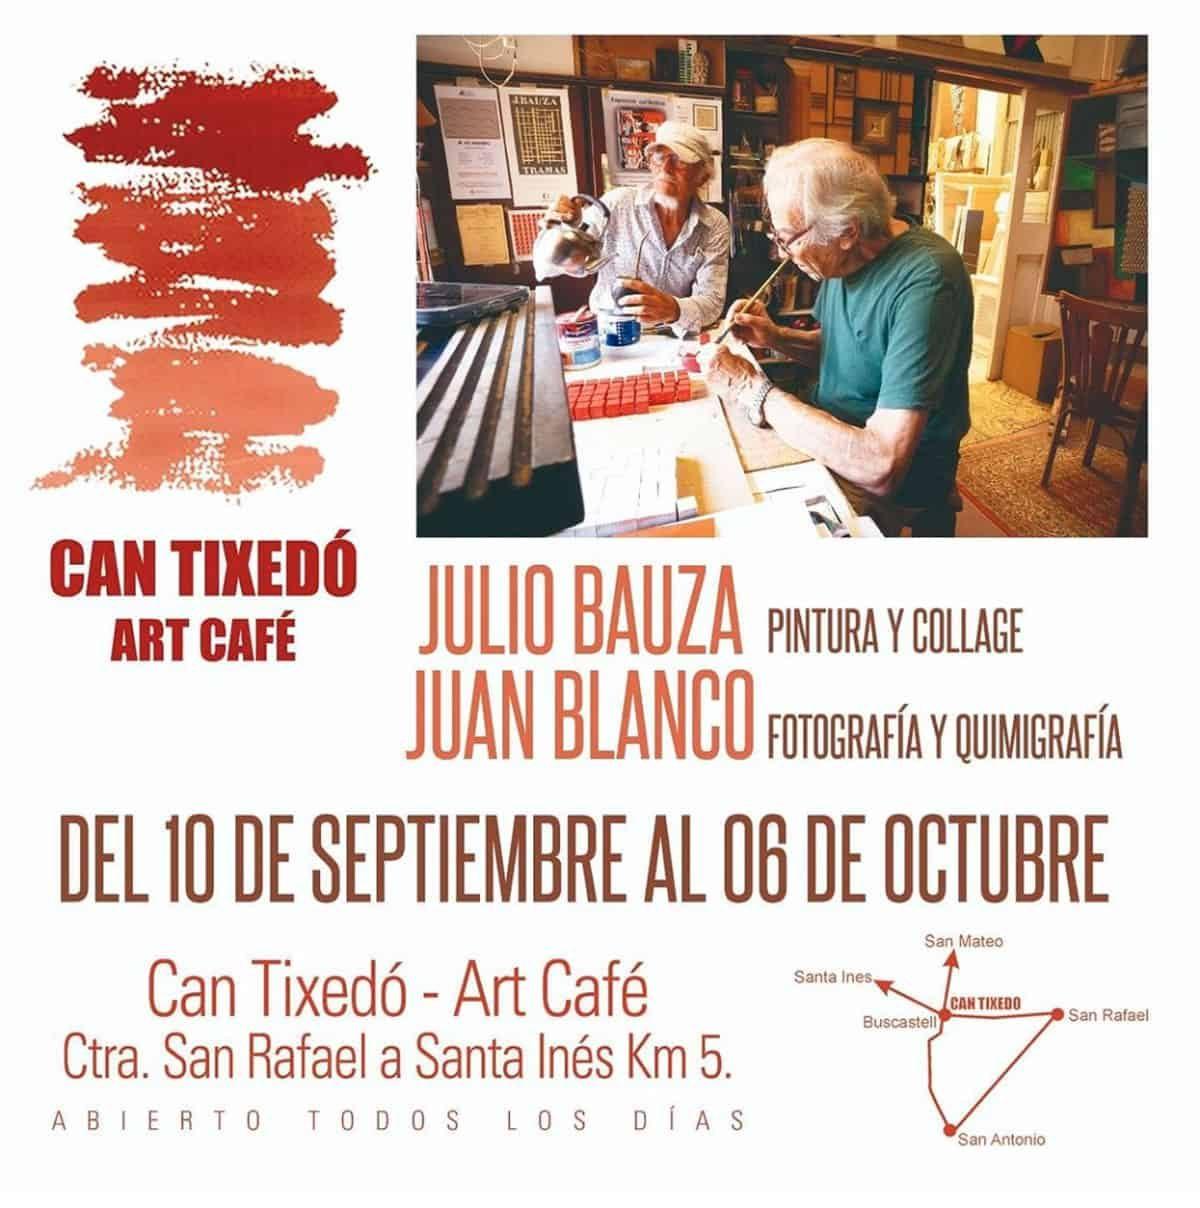 exhibition-julio-bauza-juan-blanco-can-tixedo-ibiza-2021-welcometoibiza